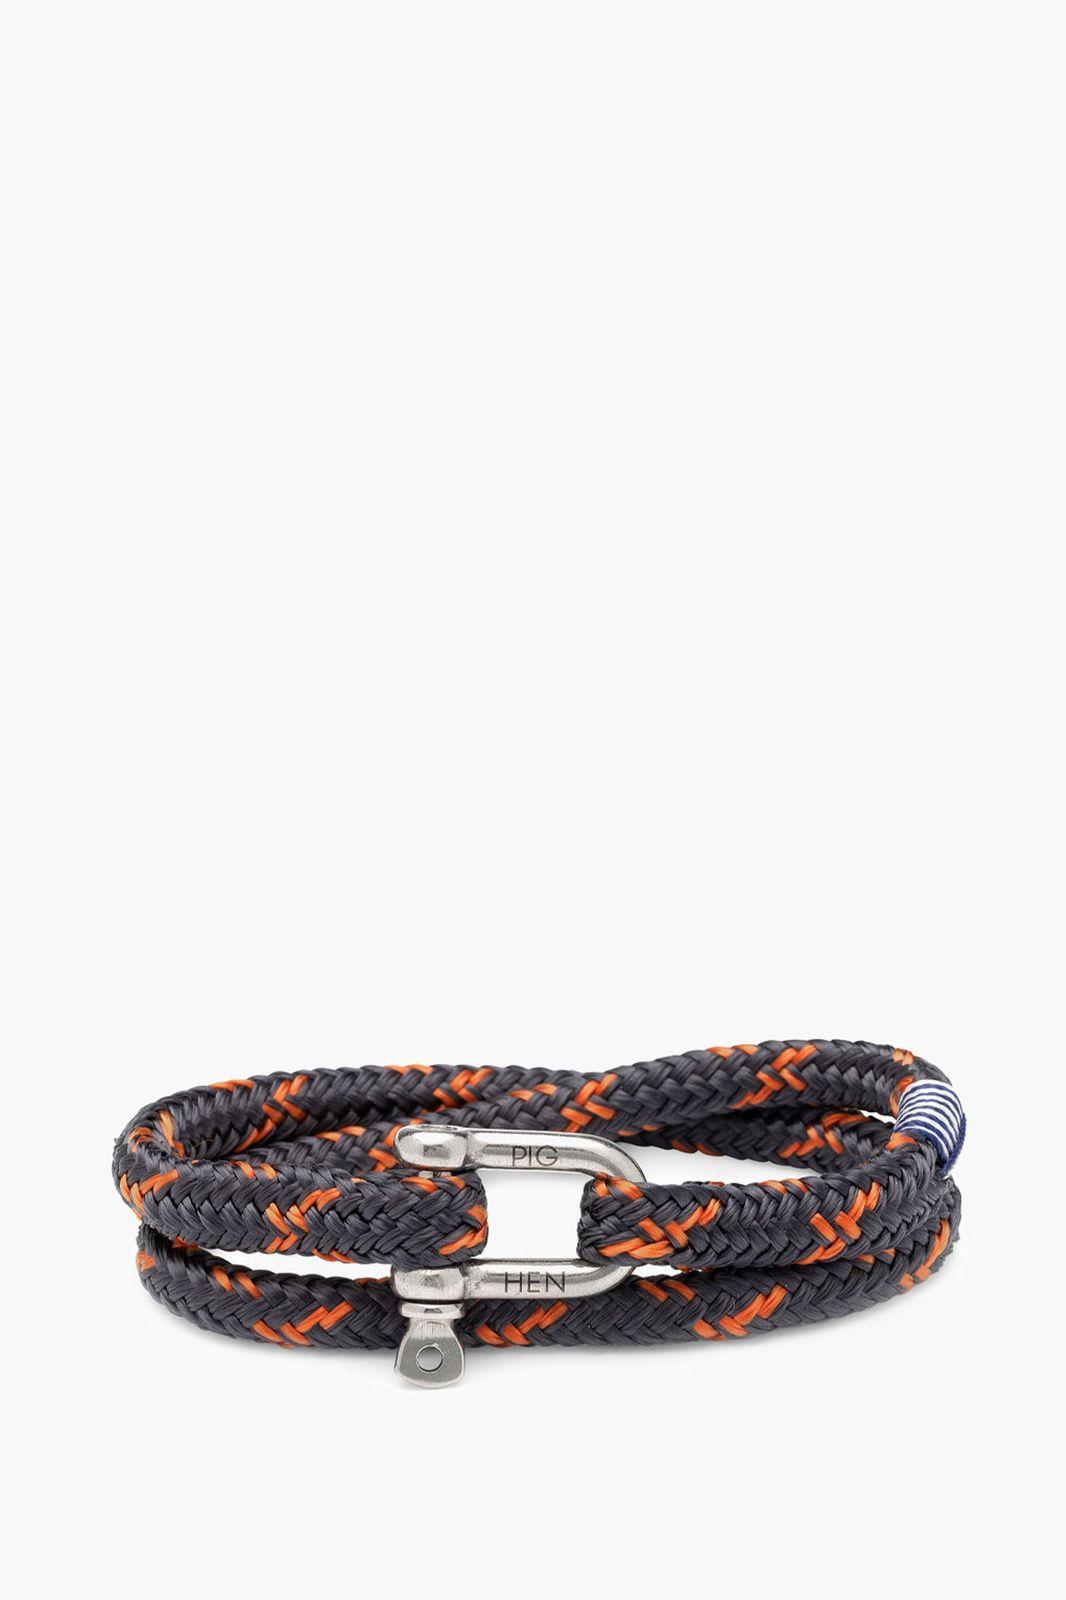 pig & Hen Salty Steve armband oranje - Heren   Sissy-Boy